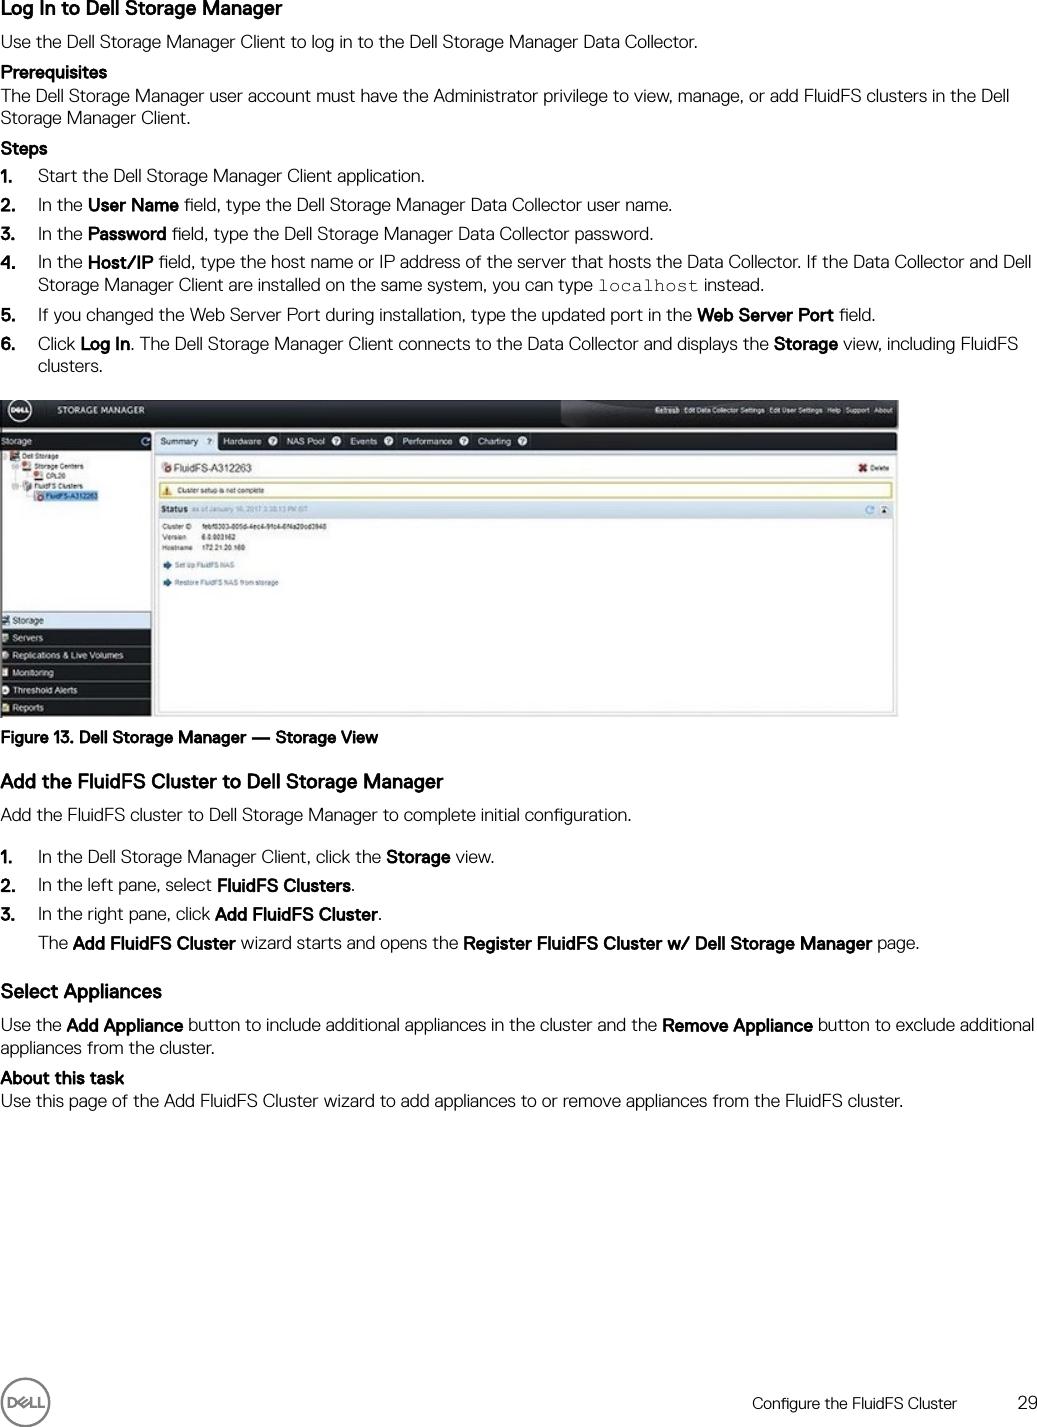 Dell compellent fs8600 FluidFS Version 6 0 Appliance Deployment